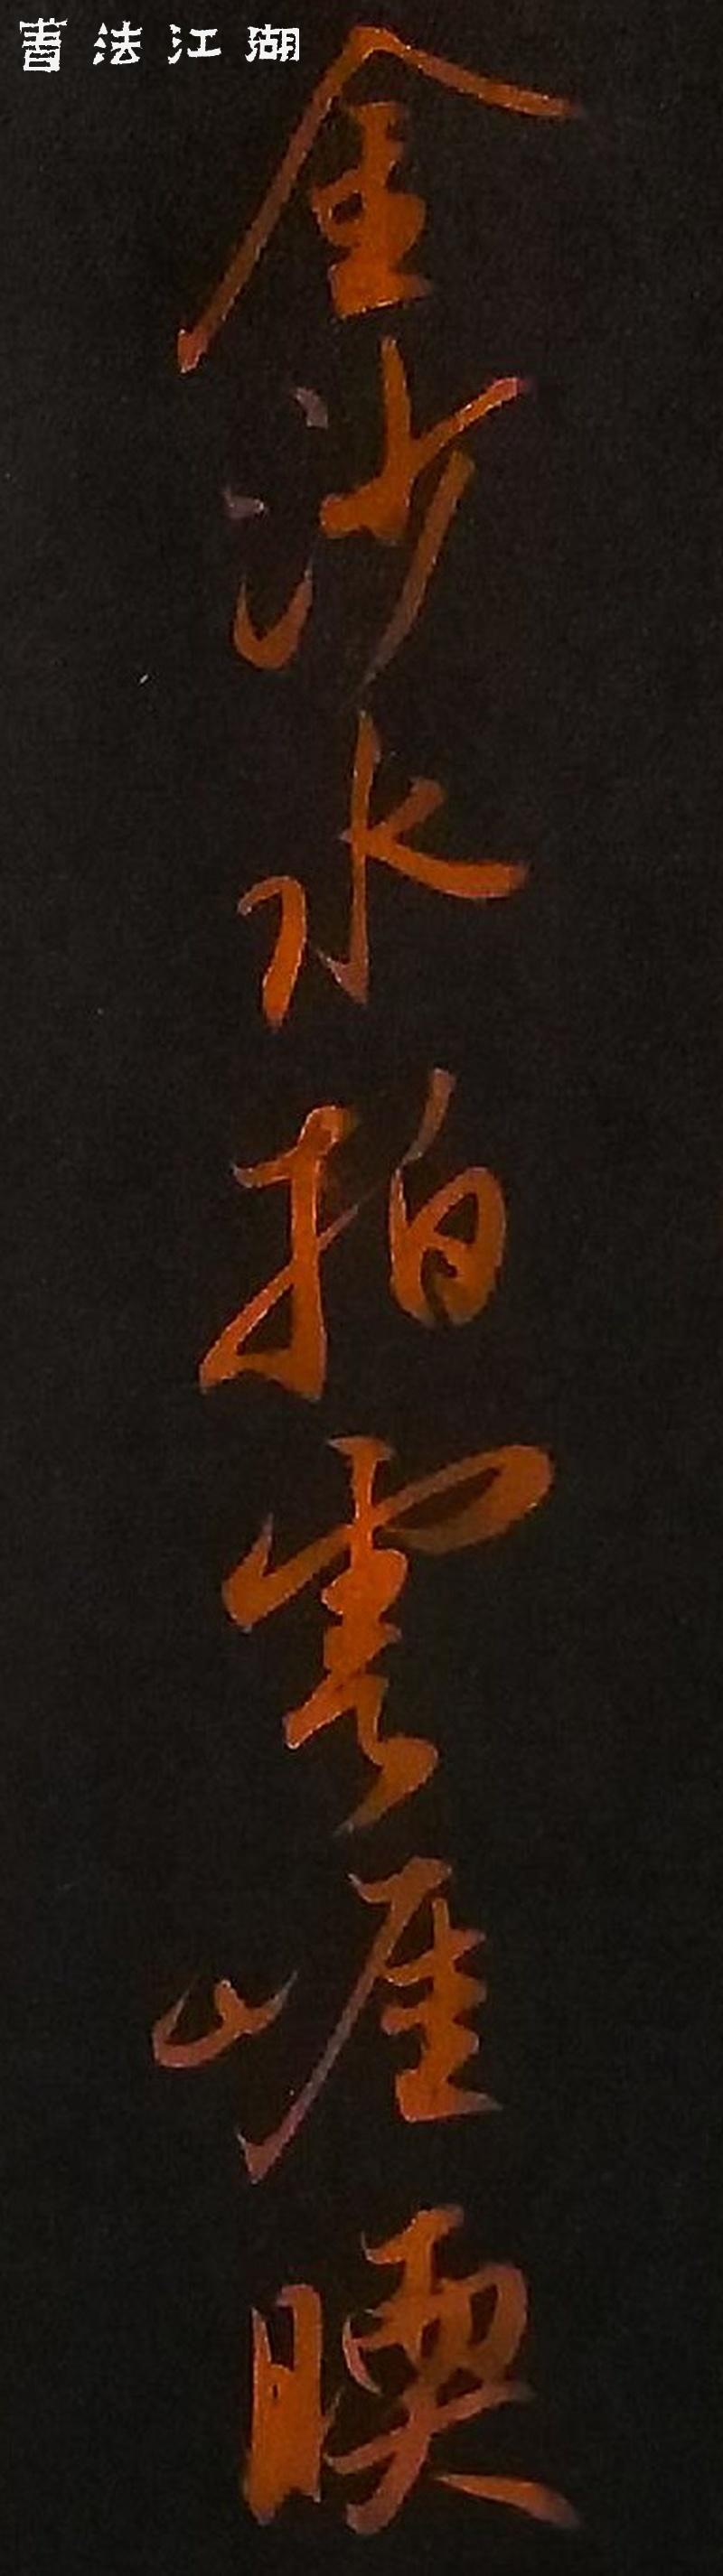 IMG_20191129_233224_看图王.jpg